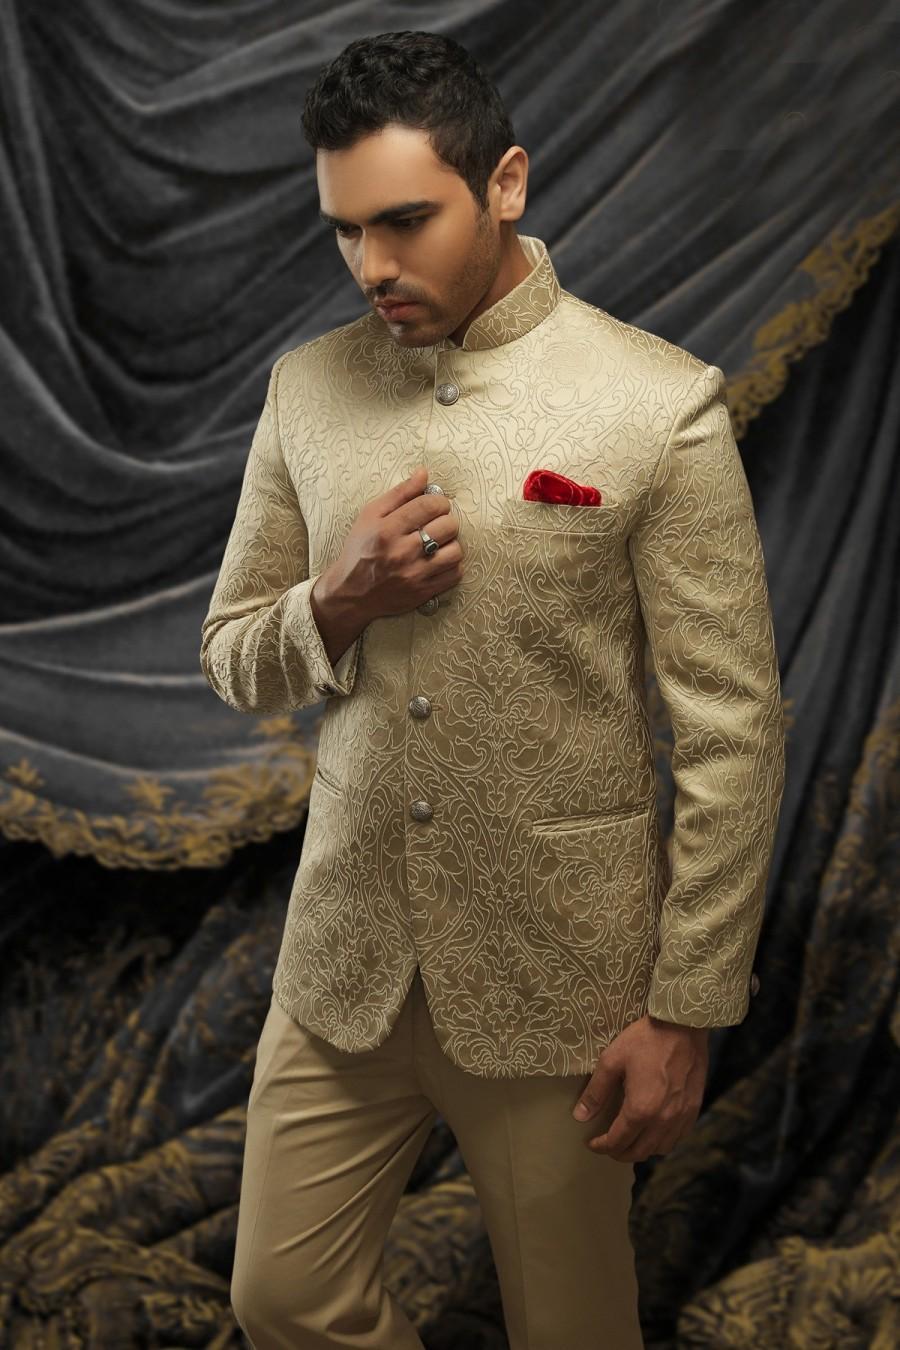 Wedding - Cream satin dashing prince suit with standing collar